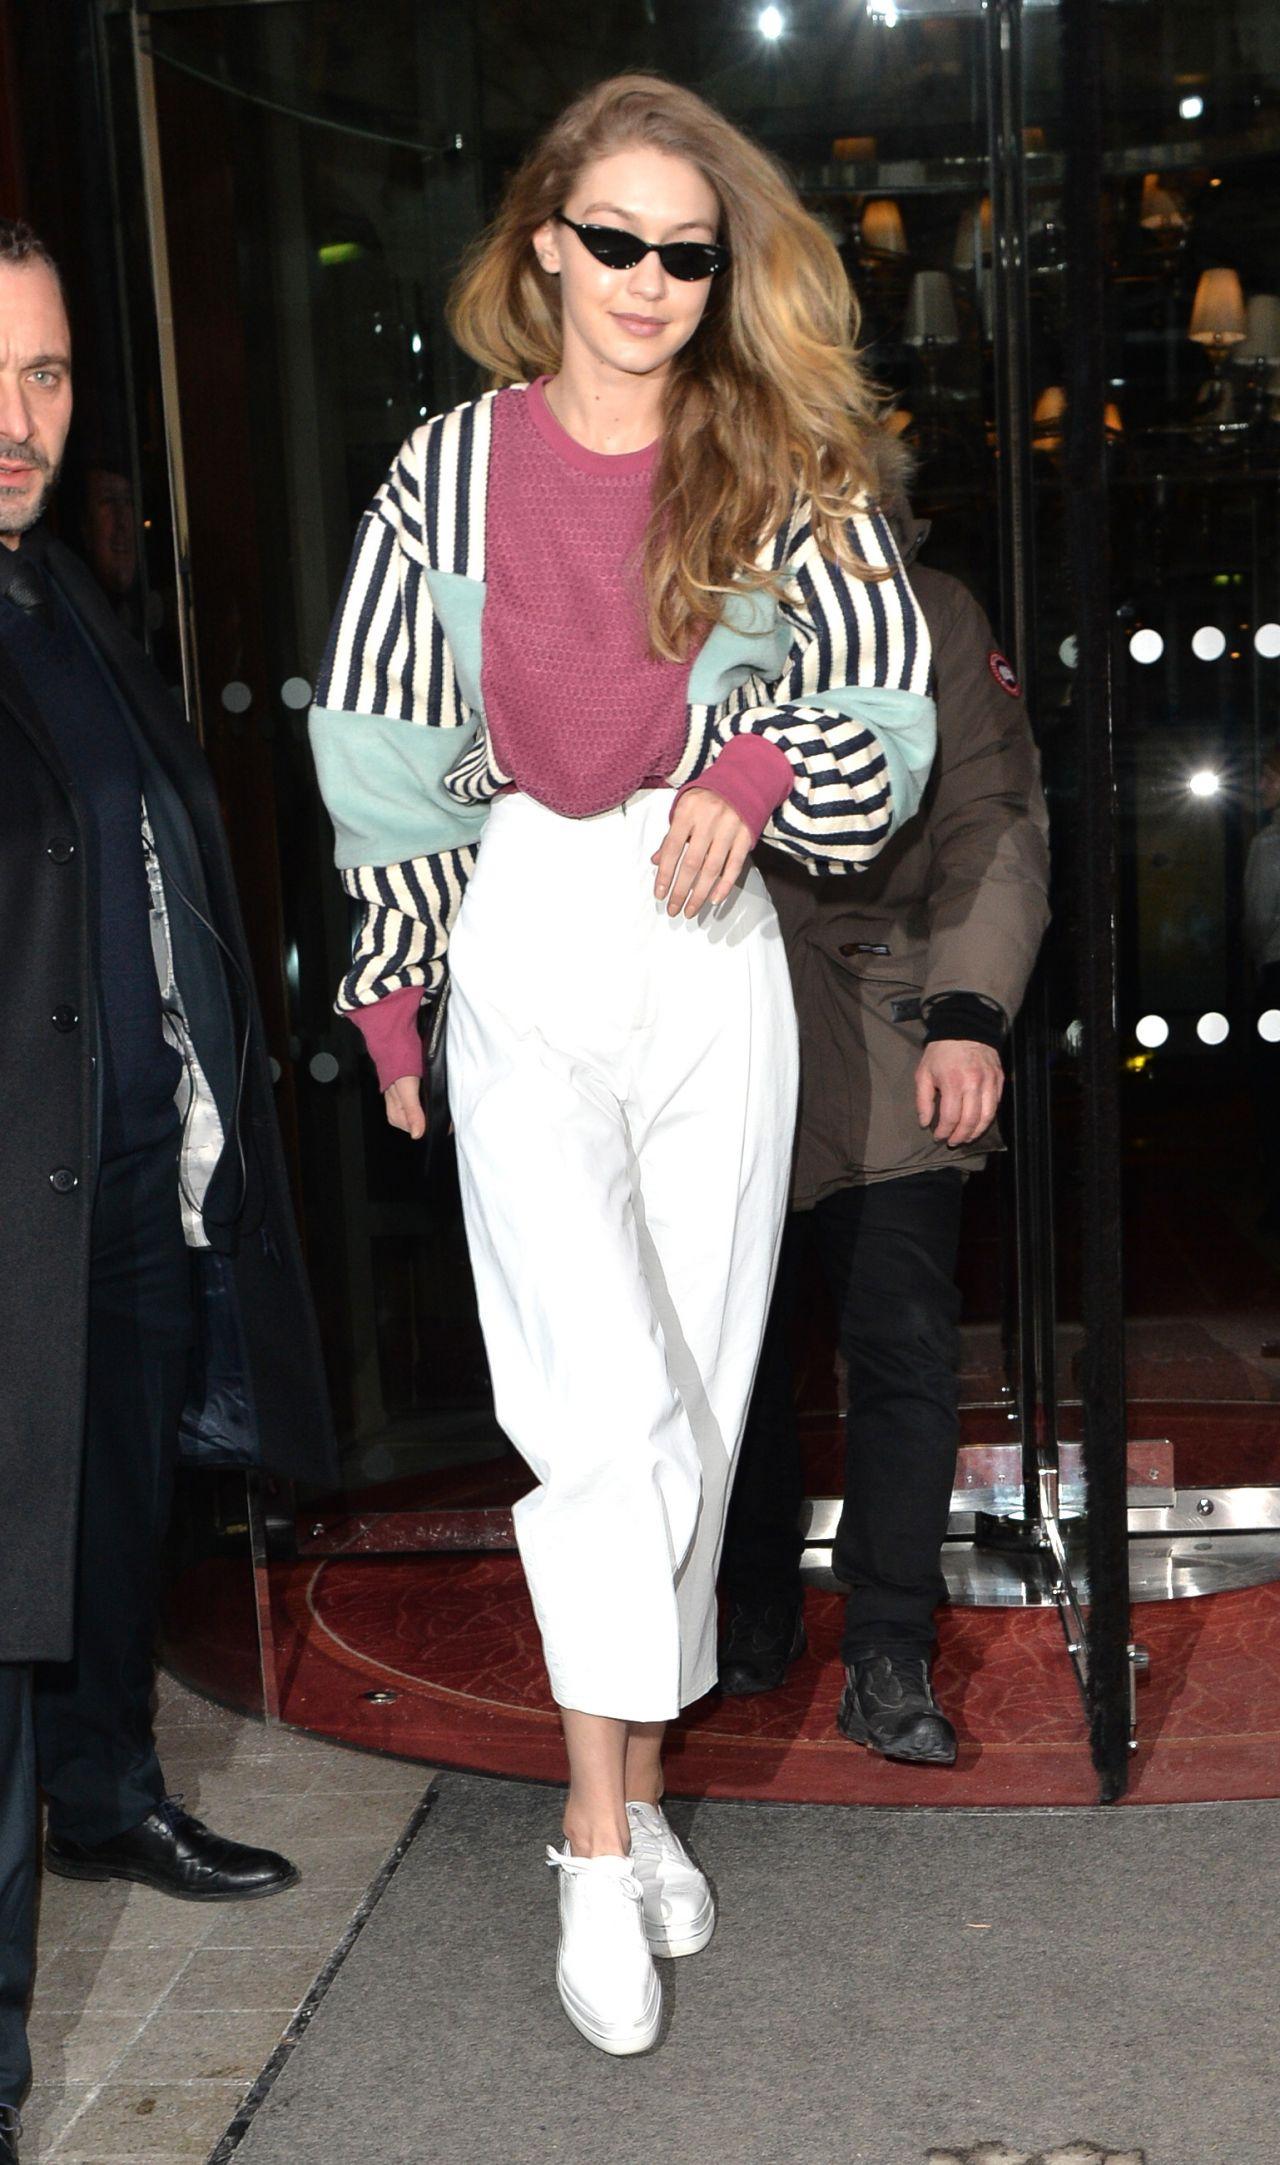 Gigi Hadid in Casual Outfit \u2013 Paris 03/01/2018